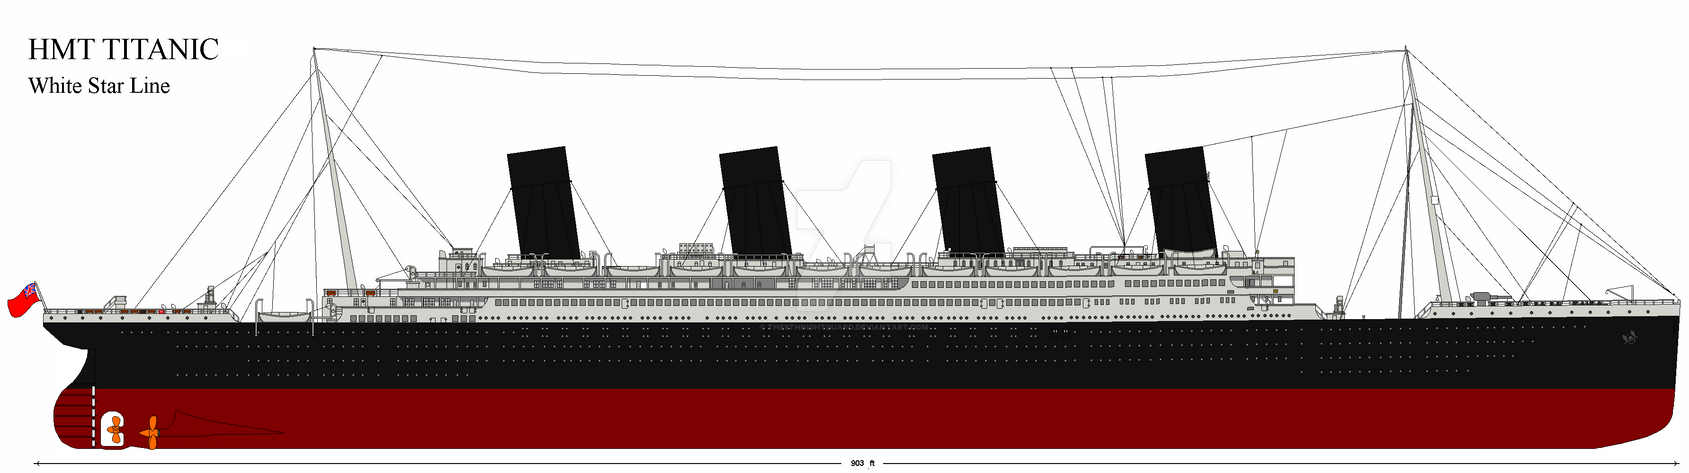 Hmt Titanic Au 1915 By The6thnightguard On Deviantart